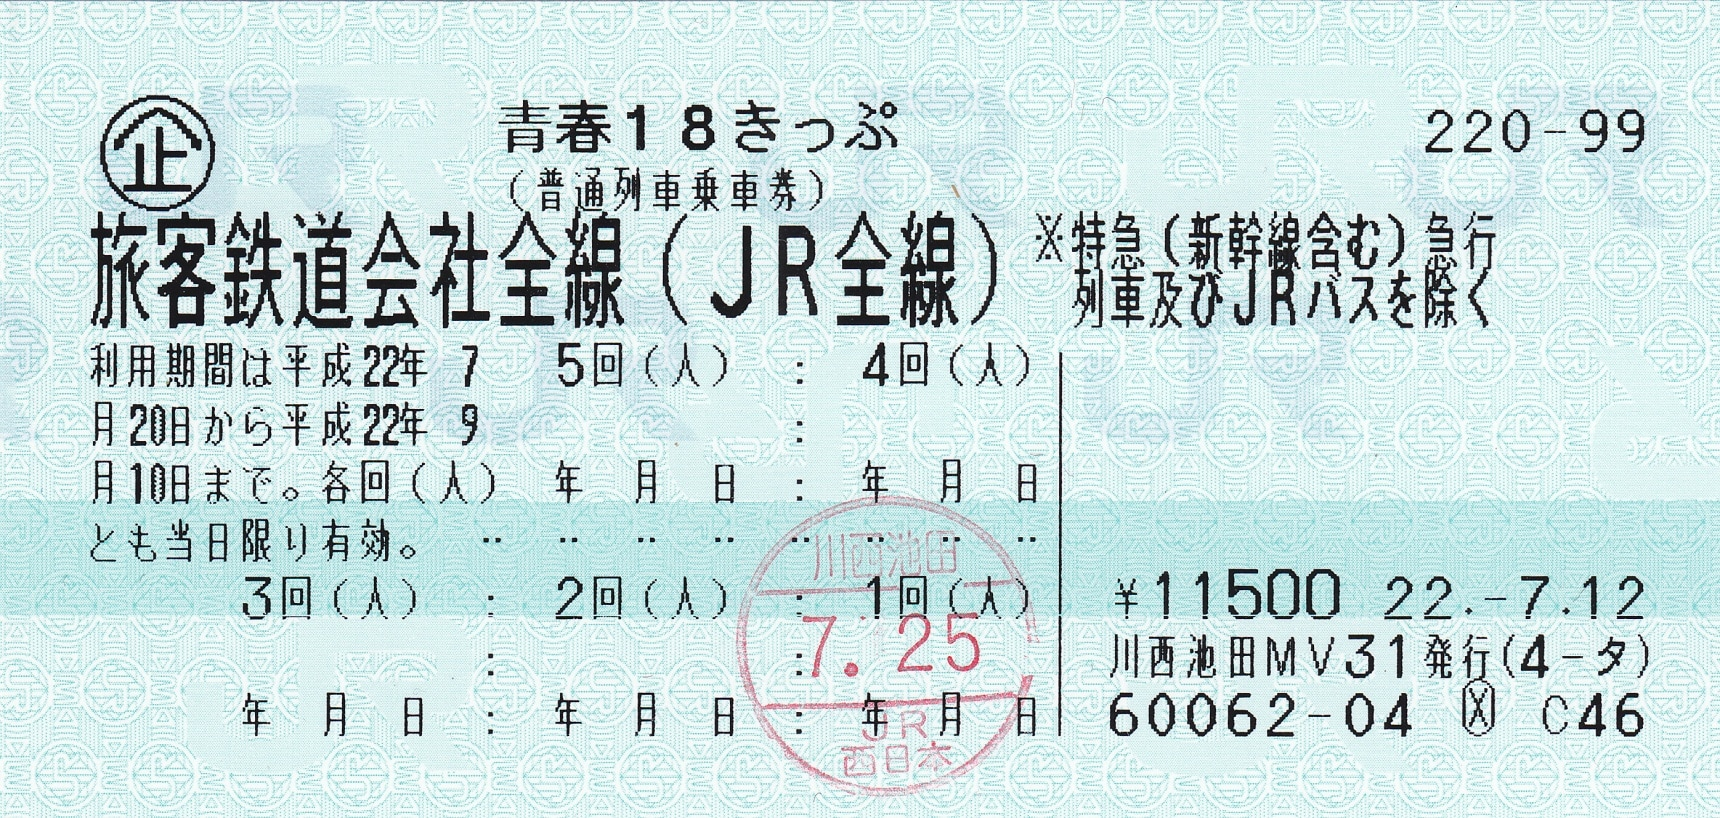 JR Pass หลบไป ใบนี้ถูกกว่าครึ่งๆ Seishun18 !